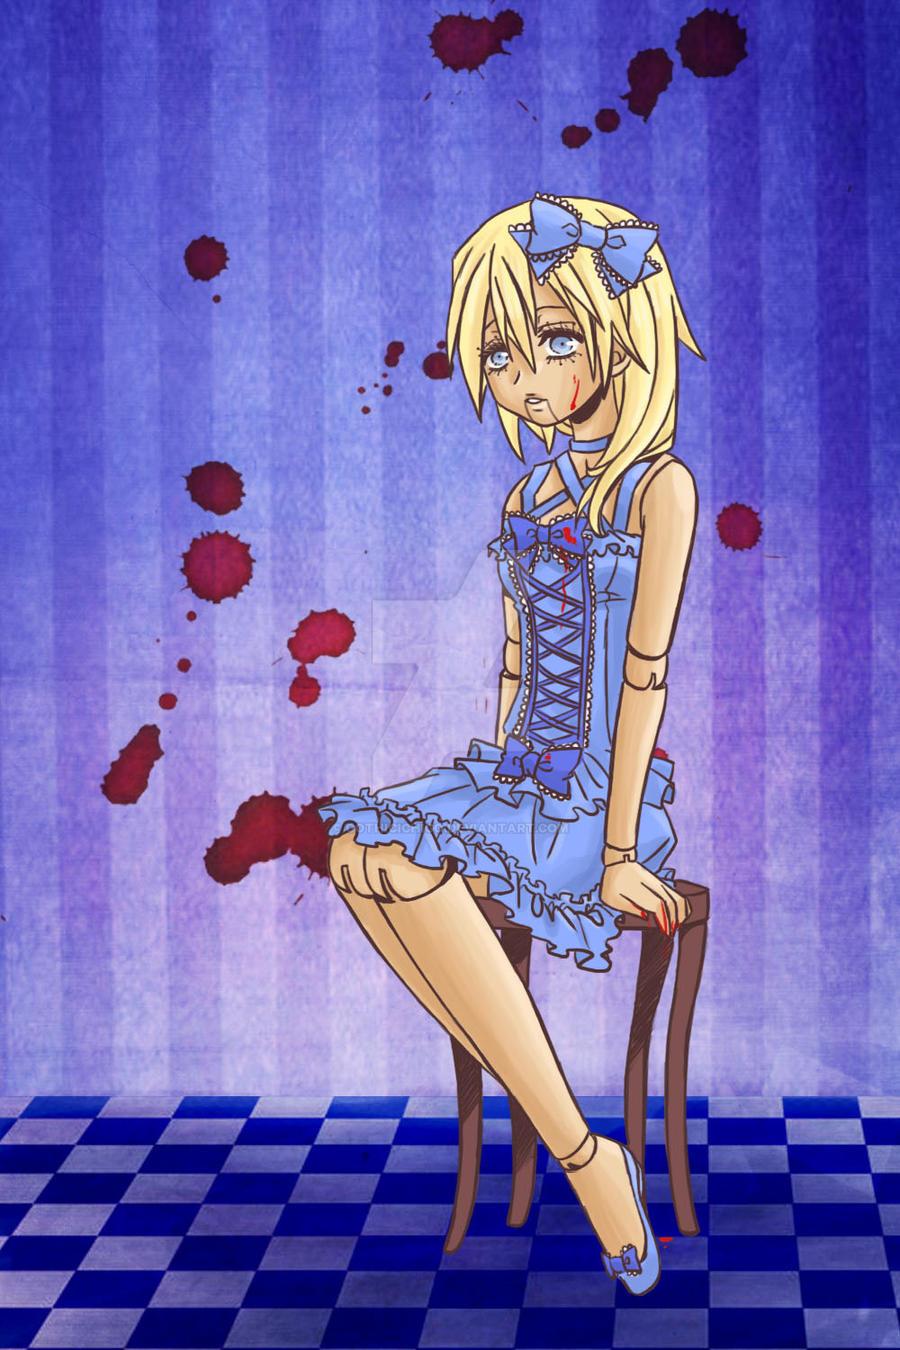 Cute Doll, Evil Soul by GothicIchigo on DeviantArt